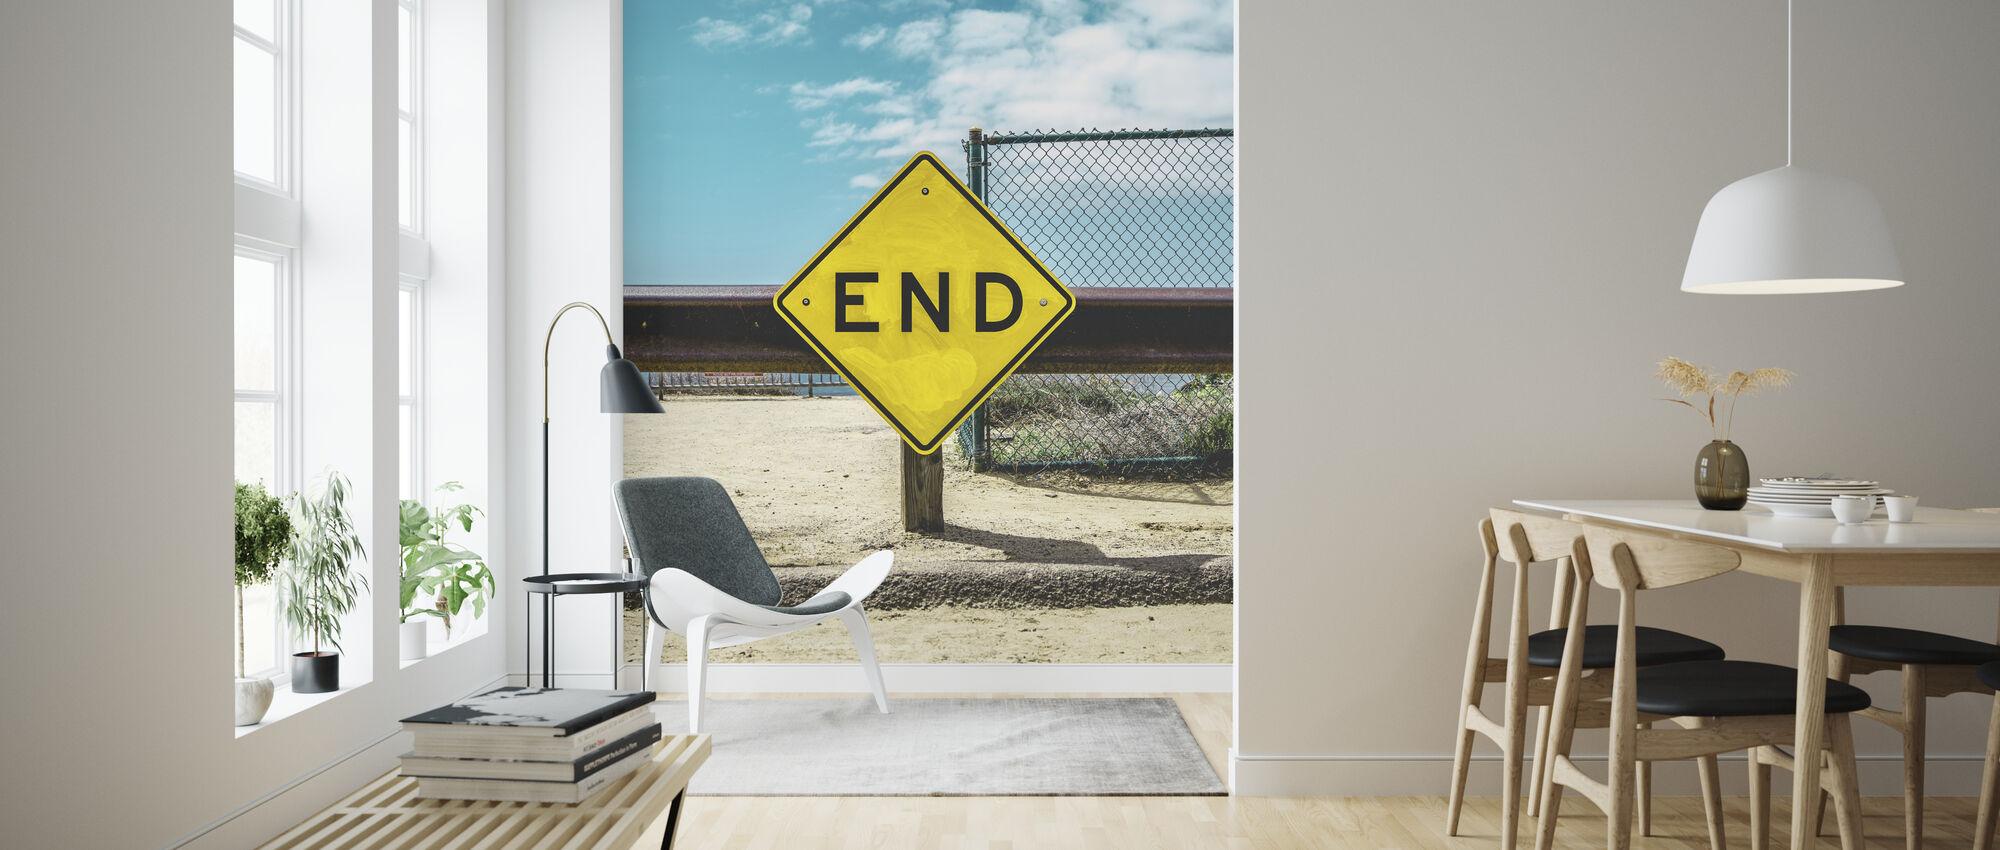 End Sign - Wallpaper - Living Room